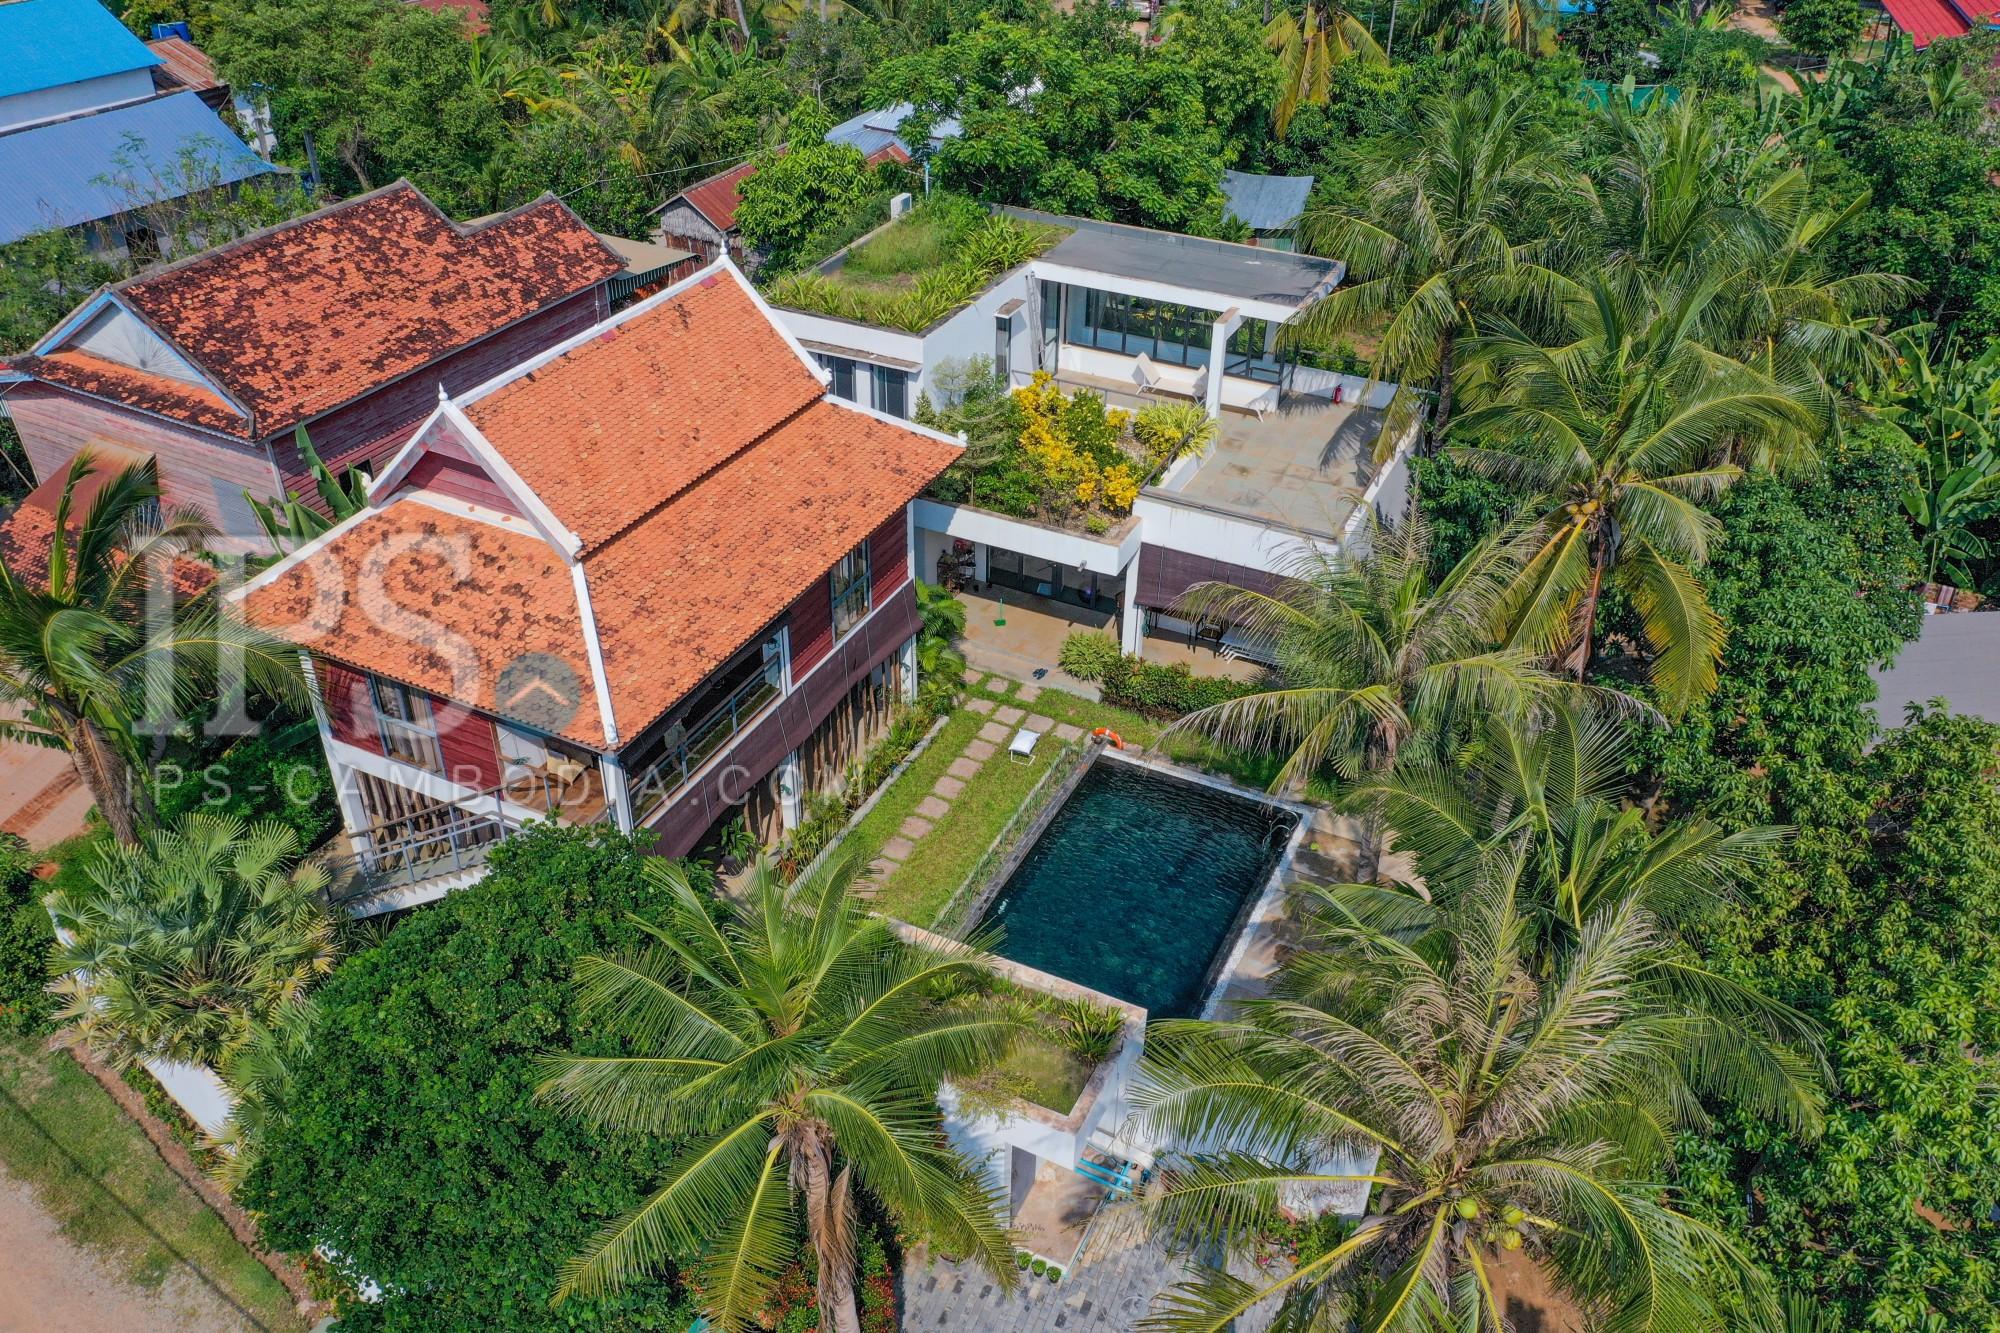 4 Bedroom Villa For Rent - Sangkat Siem Reap, Siem Reap